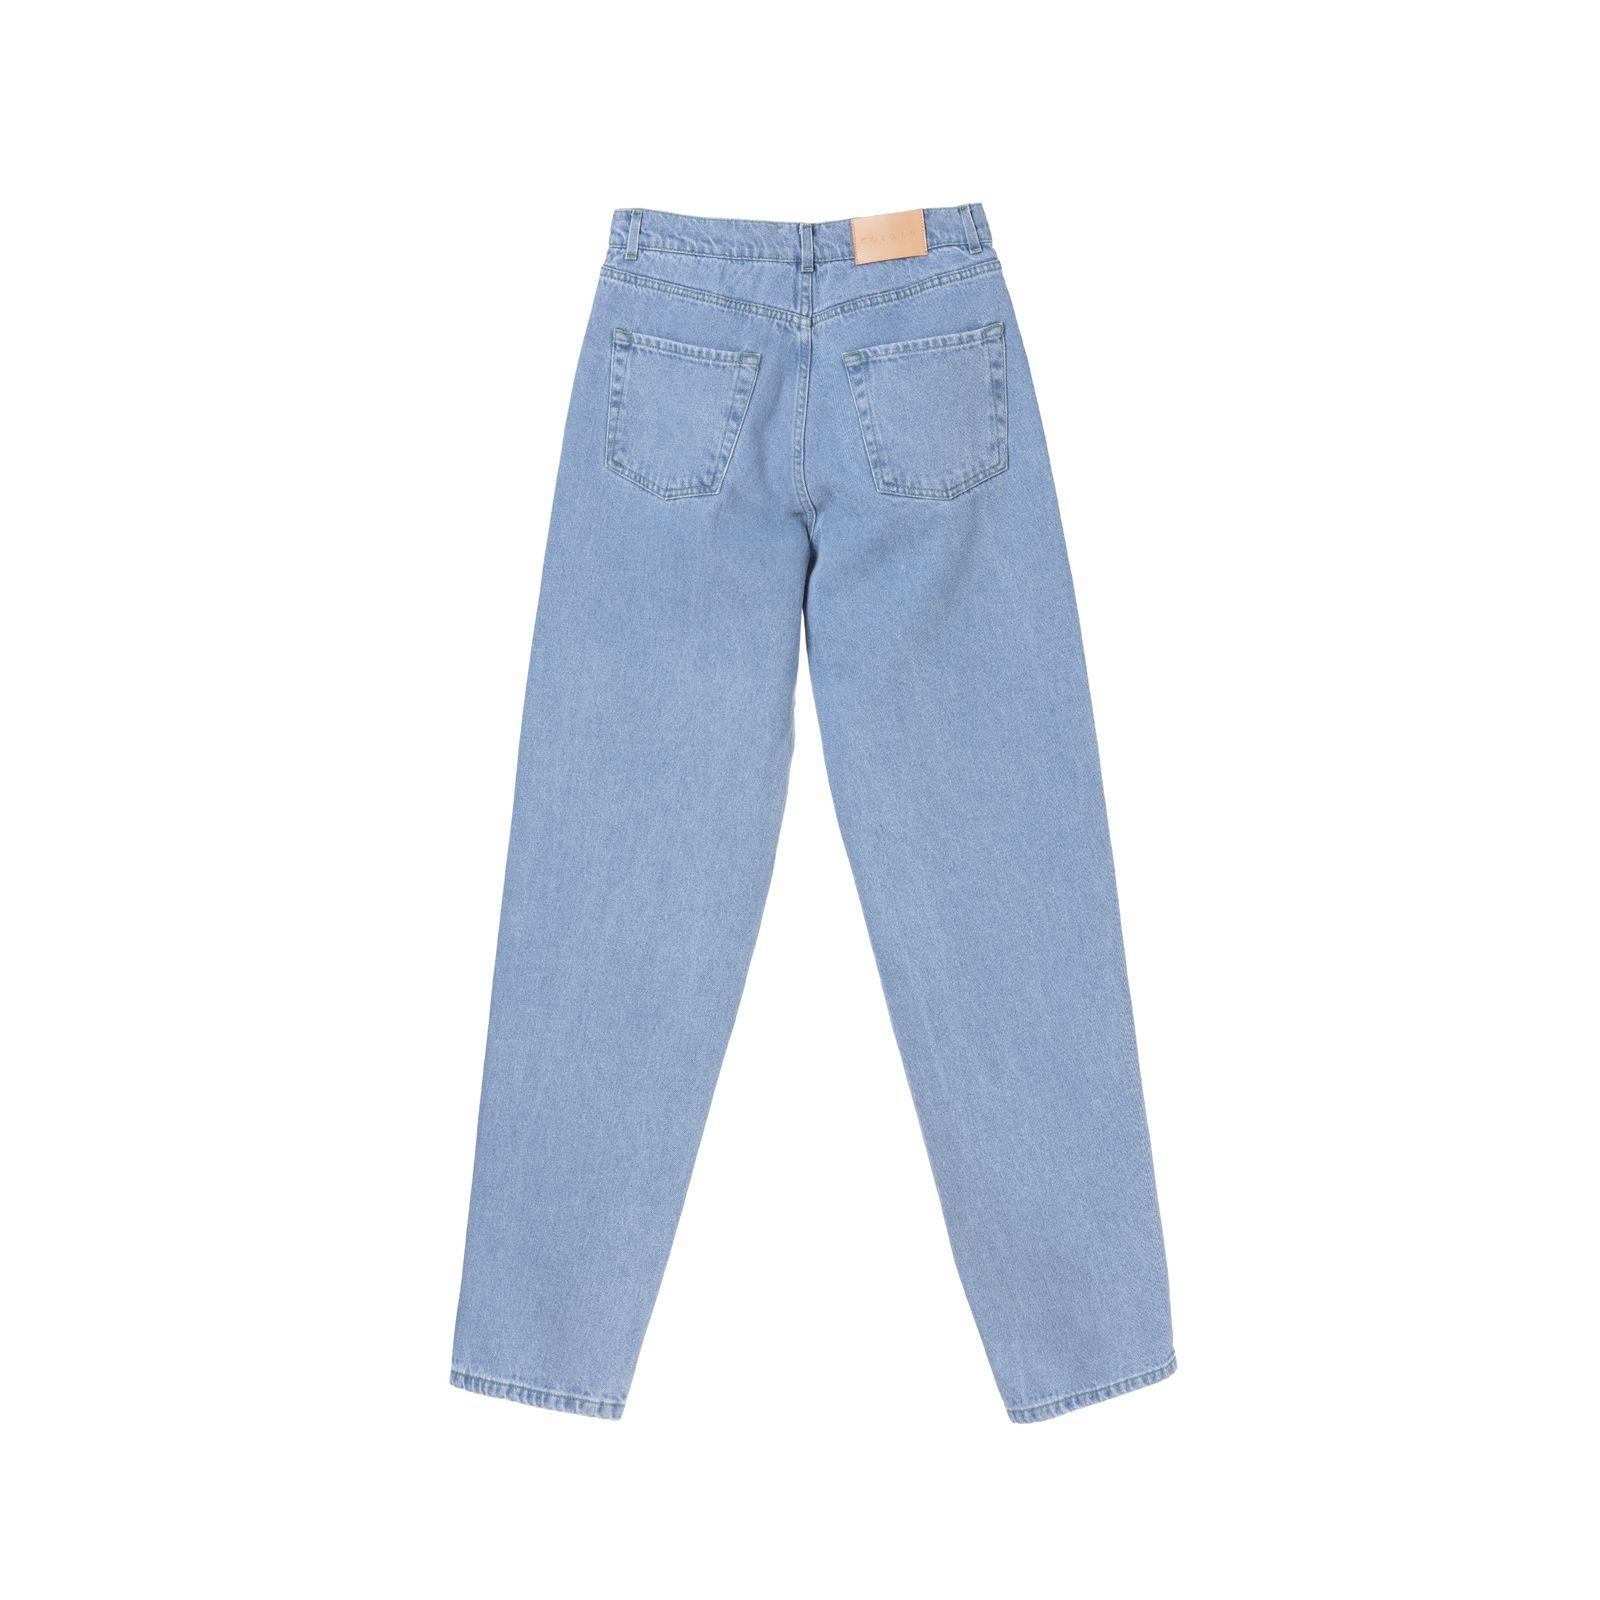 شلوار جین مردانه کوی مدل دایی رنگ آبی روشن -  - 3